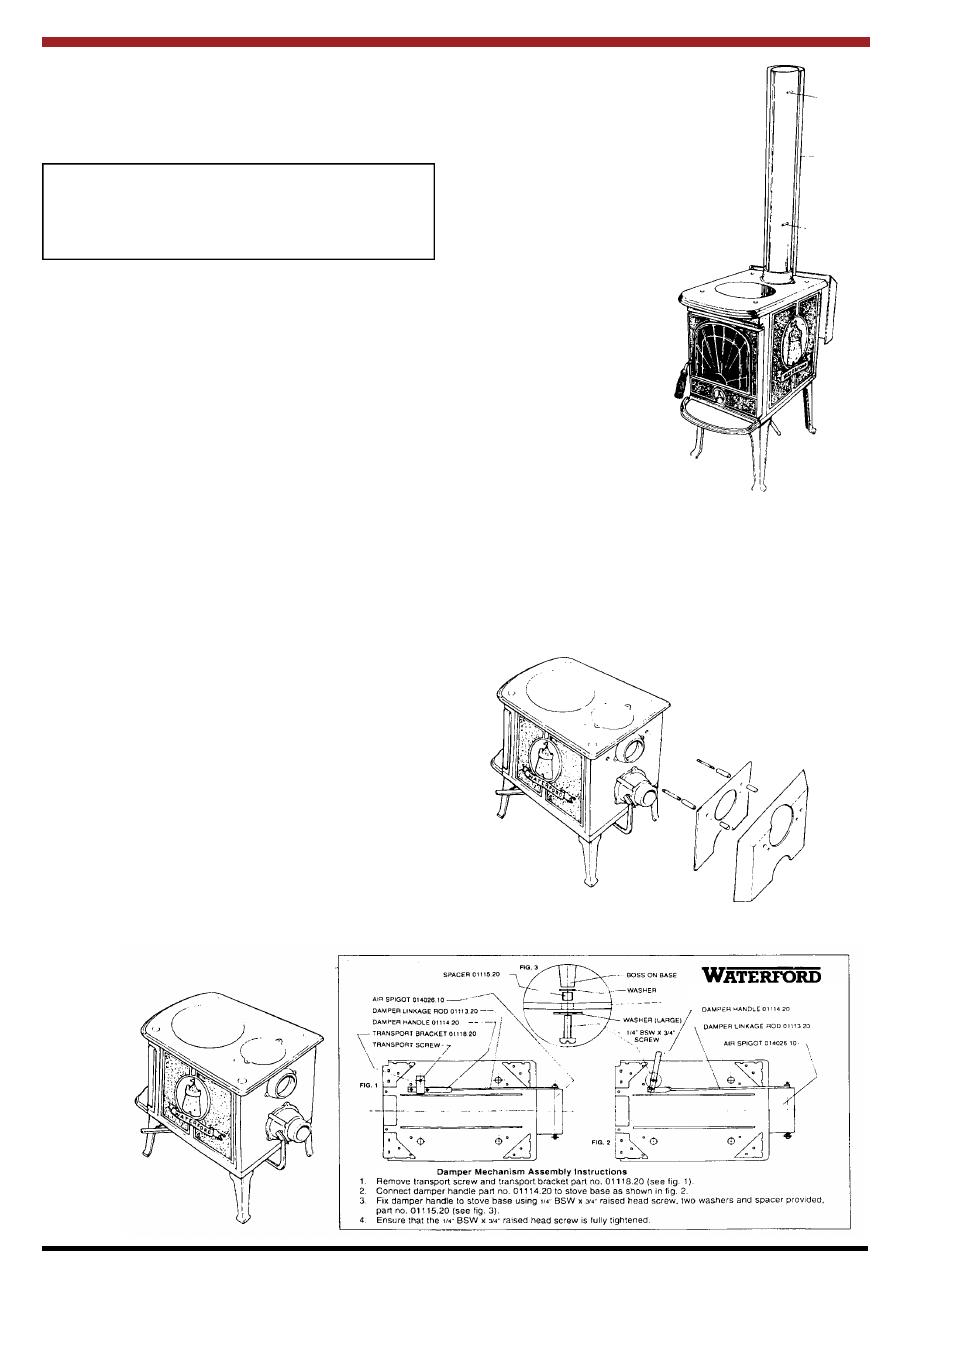 Waterford Appliances LEPRECHAUN 90 O.S.A User Manual